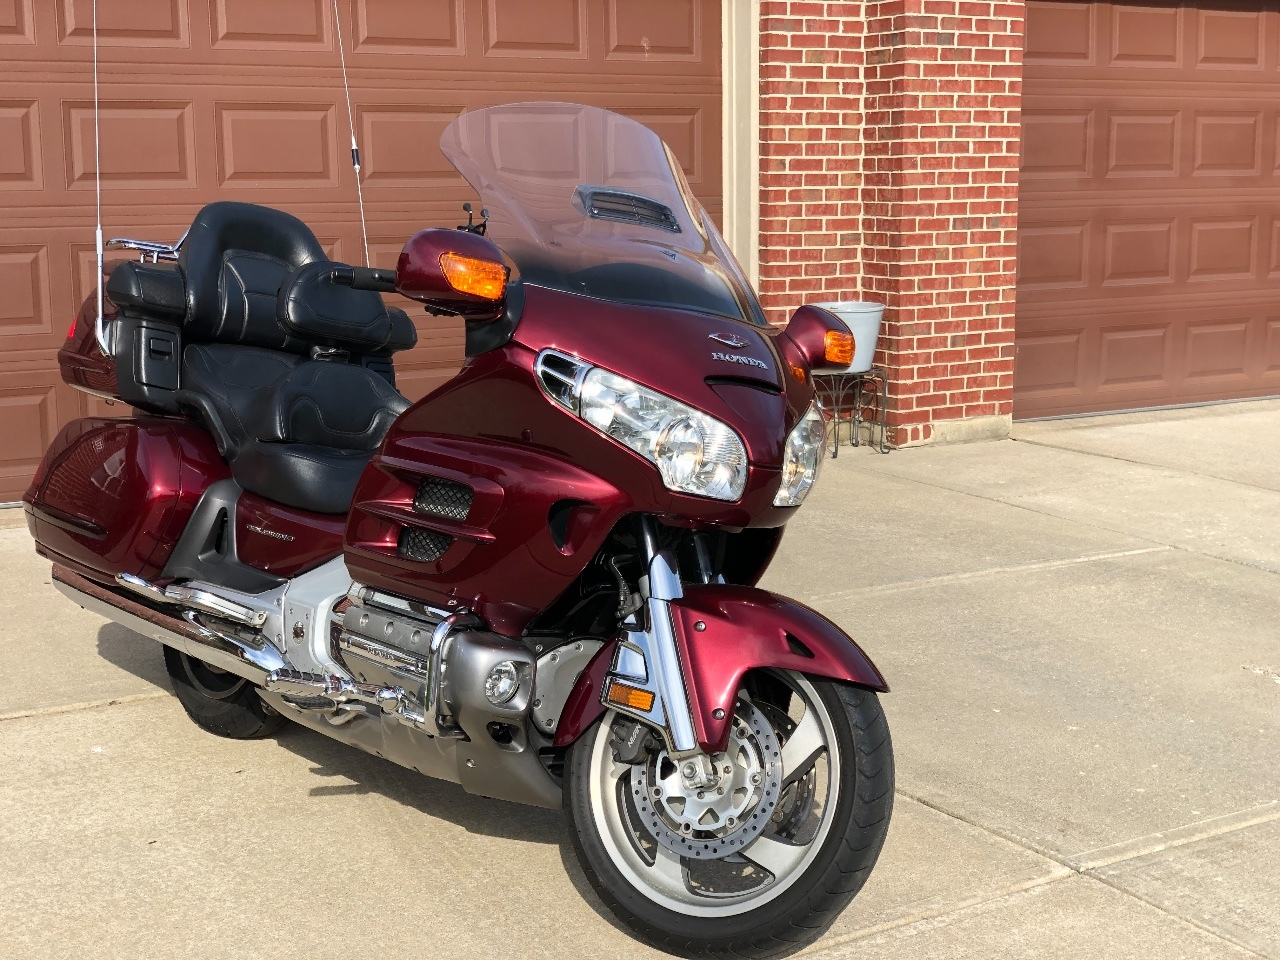 Craigslist Northwest Indiana Motorcycles | Reviewmotors.co